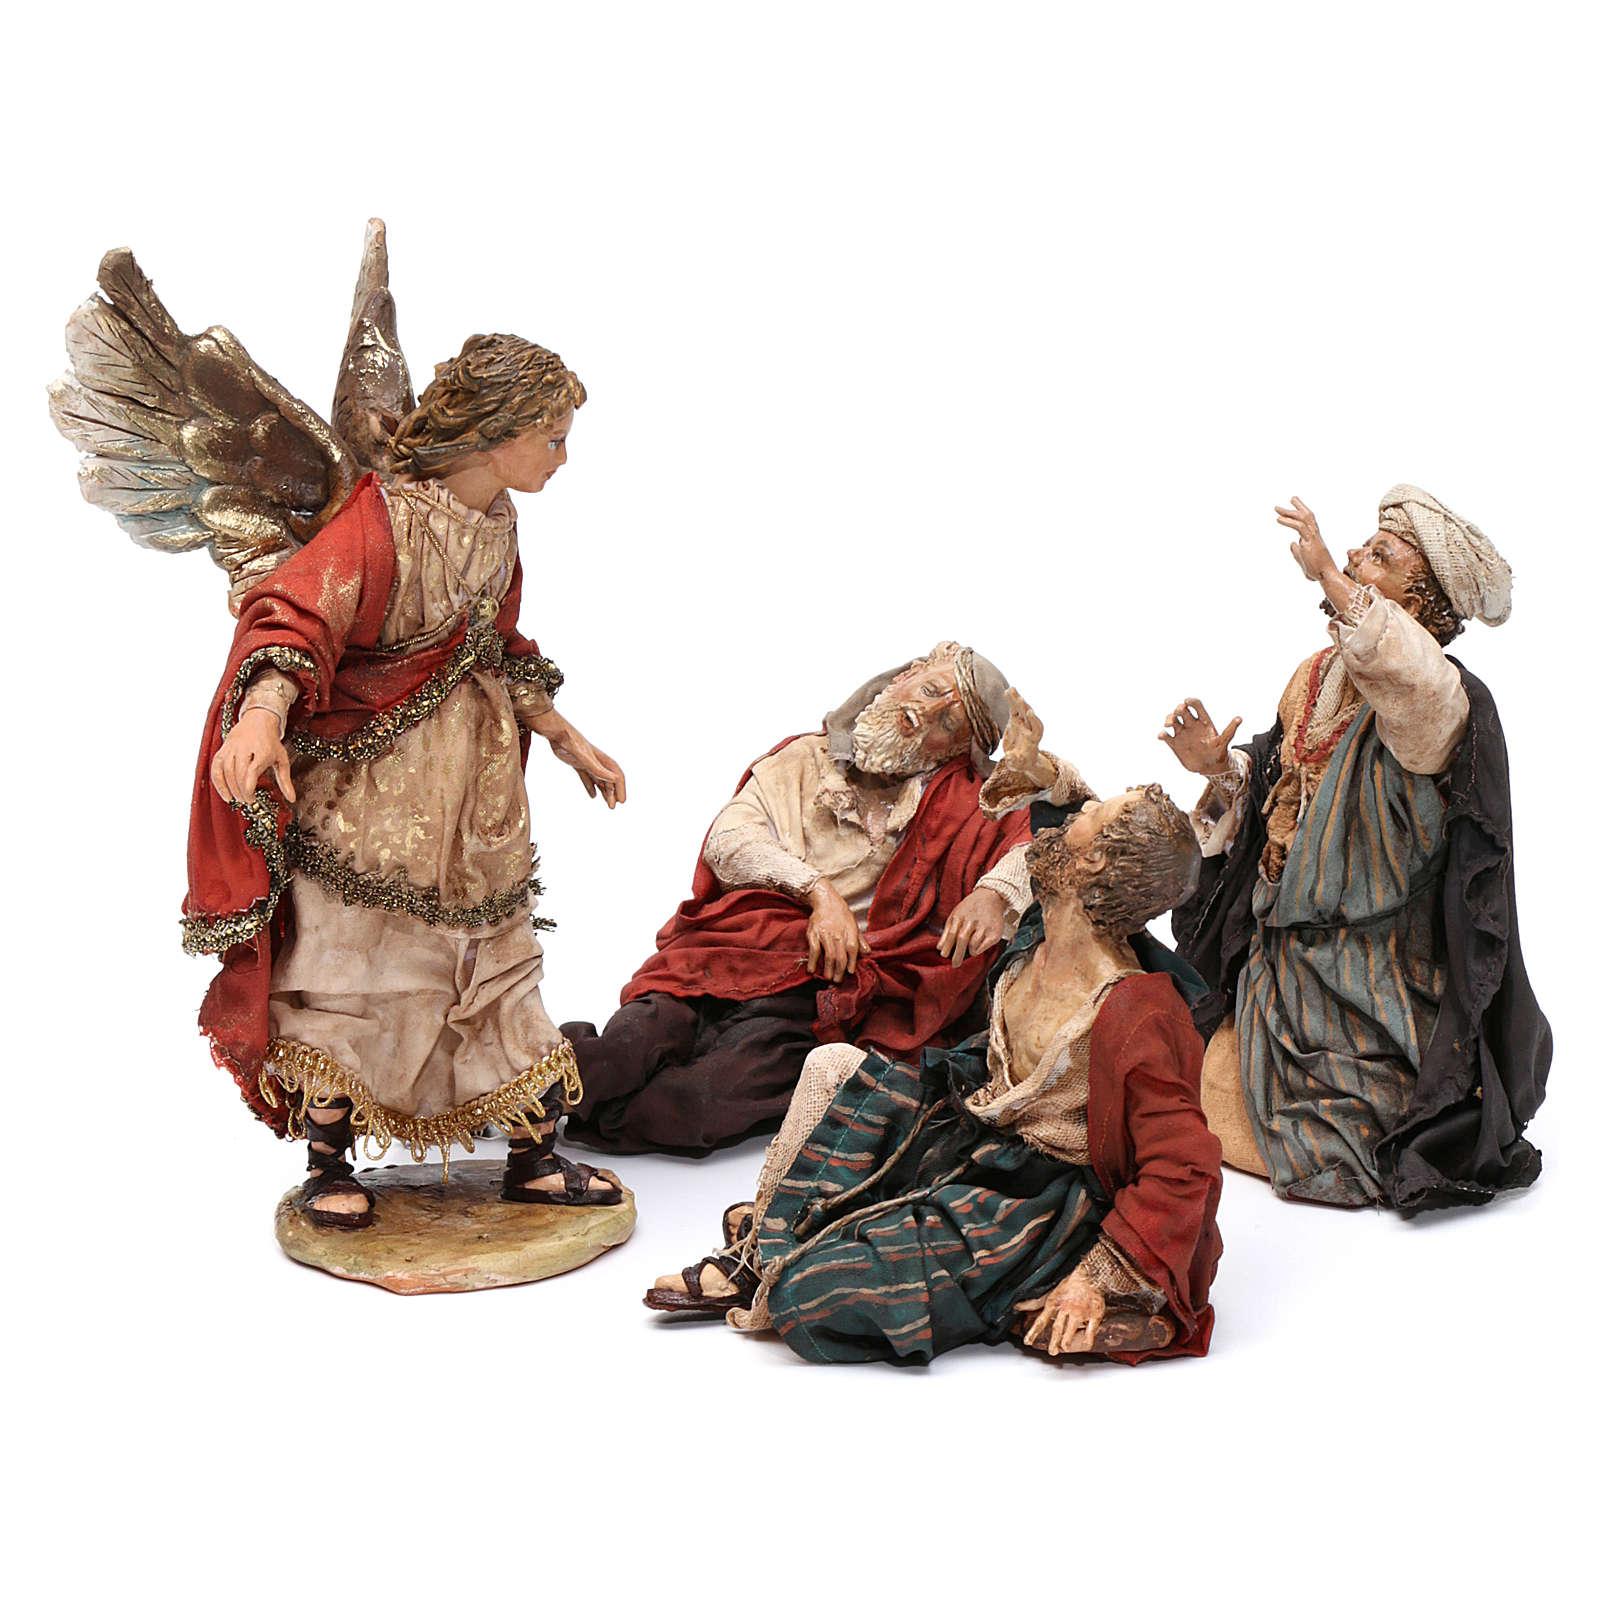 Annunciation to the Shepherds scene, 13 cm Angela Tripi figurines 4